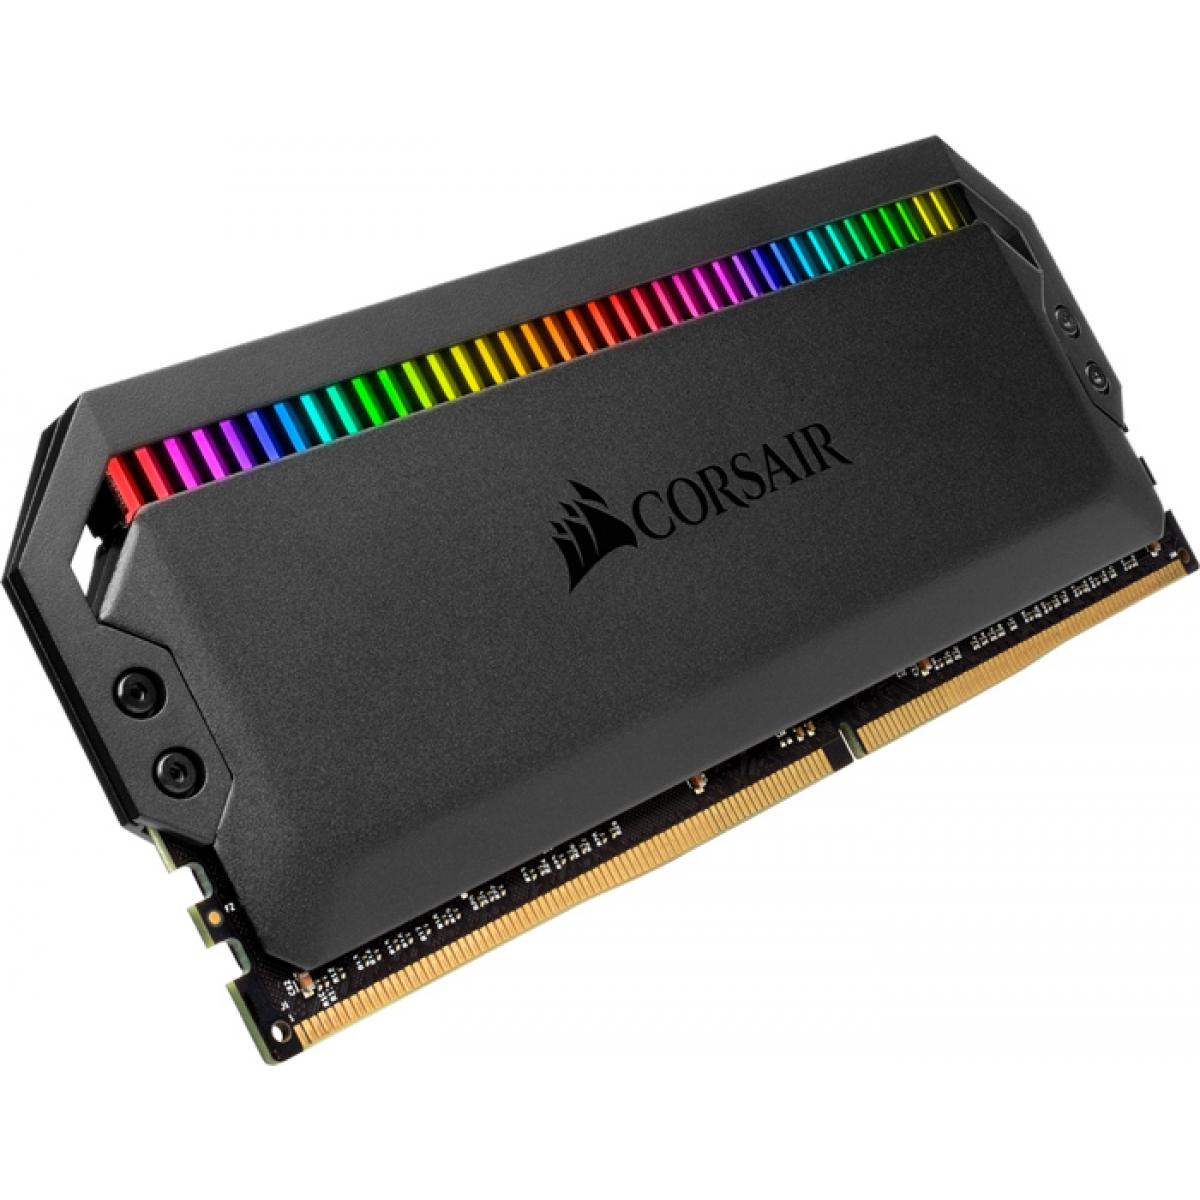 Memória DDR4 Corsair Dominator, RGB, 16GB (2x8GB), 3200MHz, CMT16GX4M2C3200C16